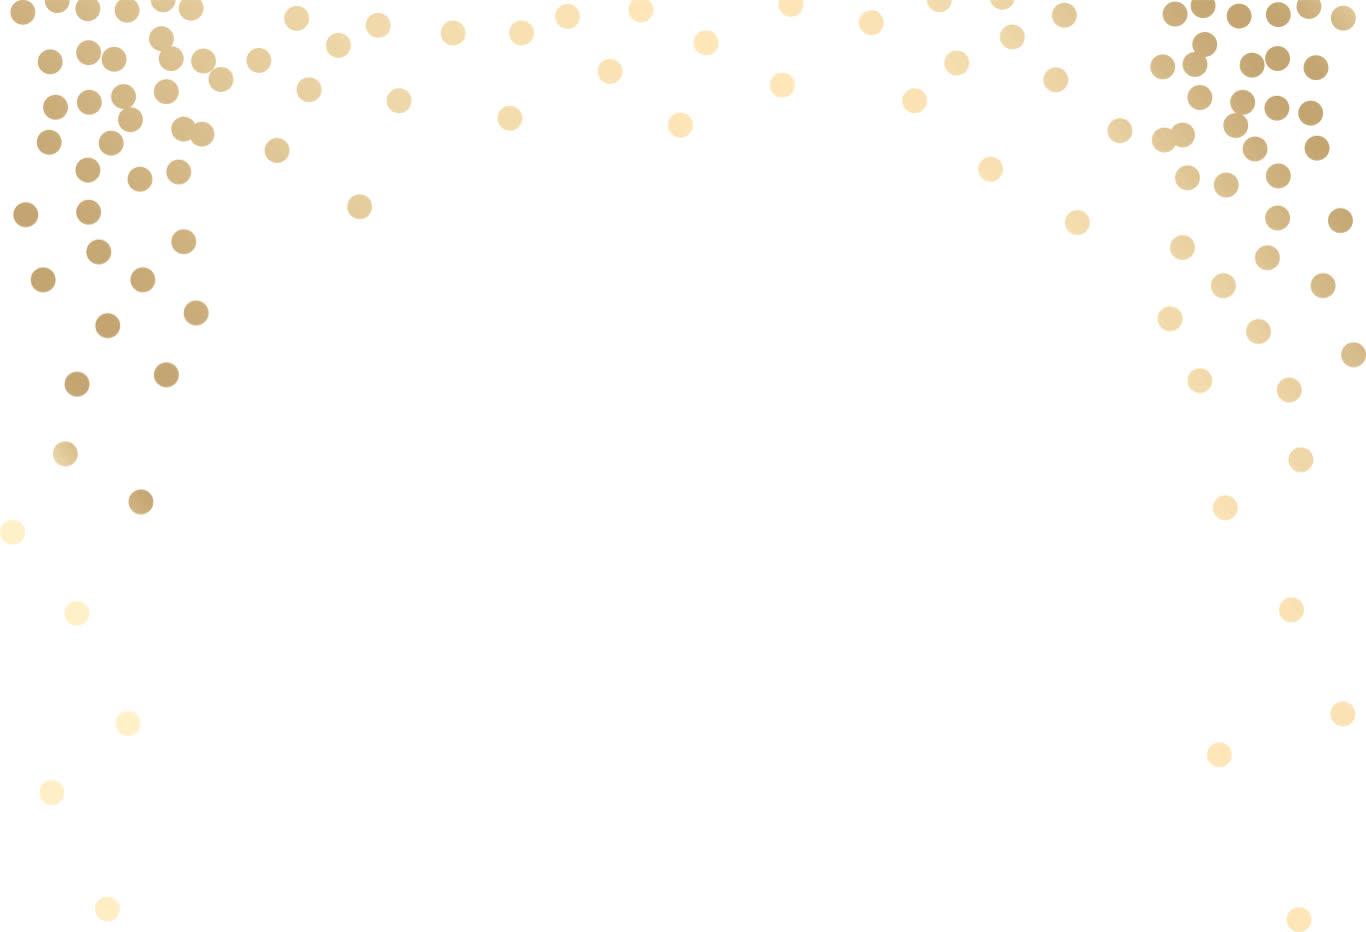 hight resolution of confetti clipart falling gif 8 gif